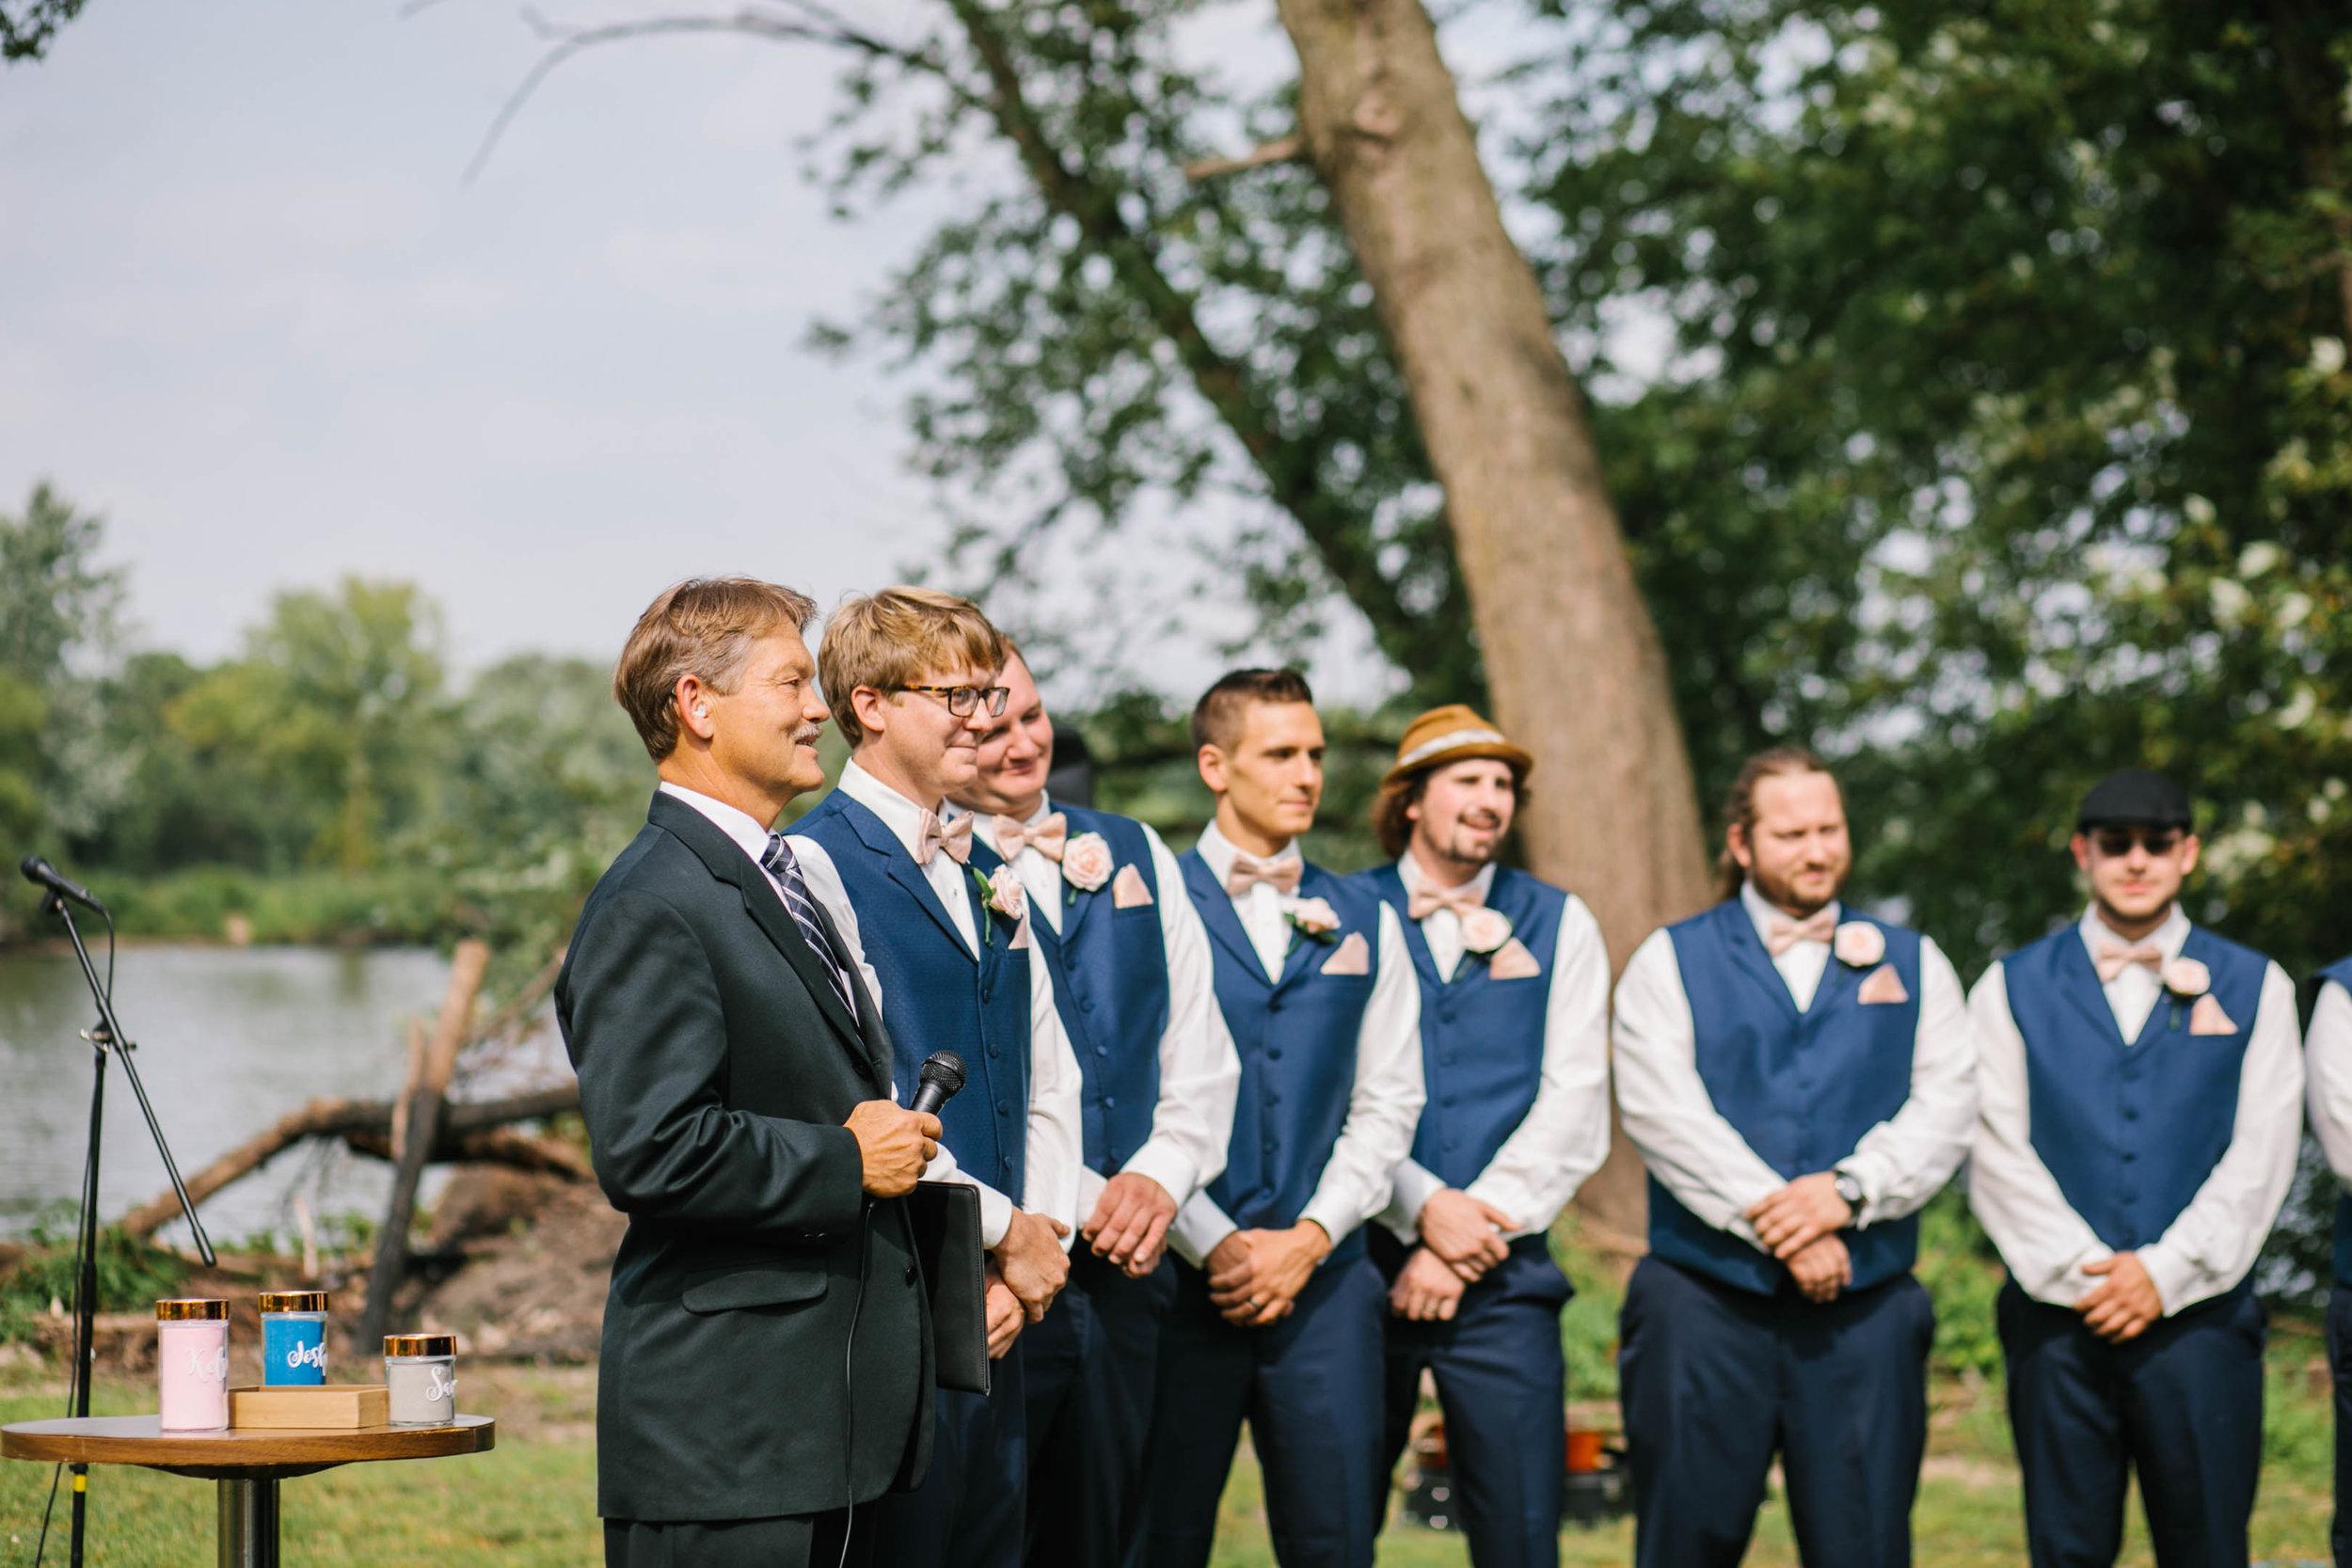 outdoor wedding ceremony northeast iowa cedar falls